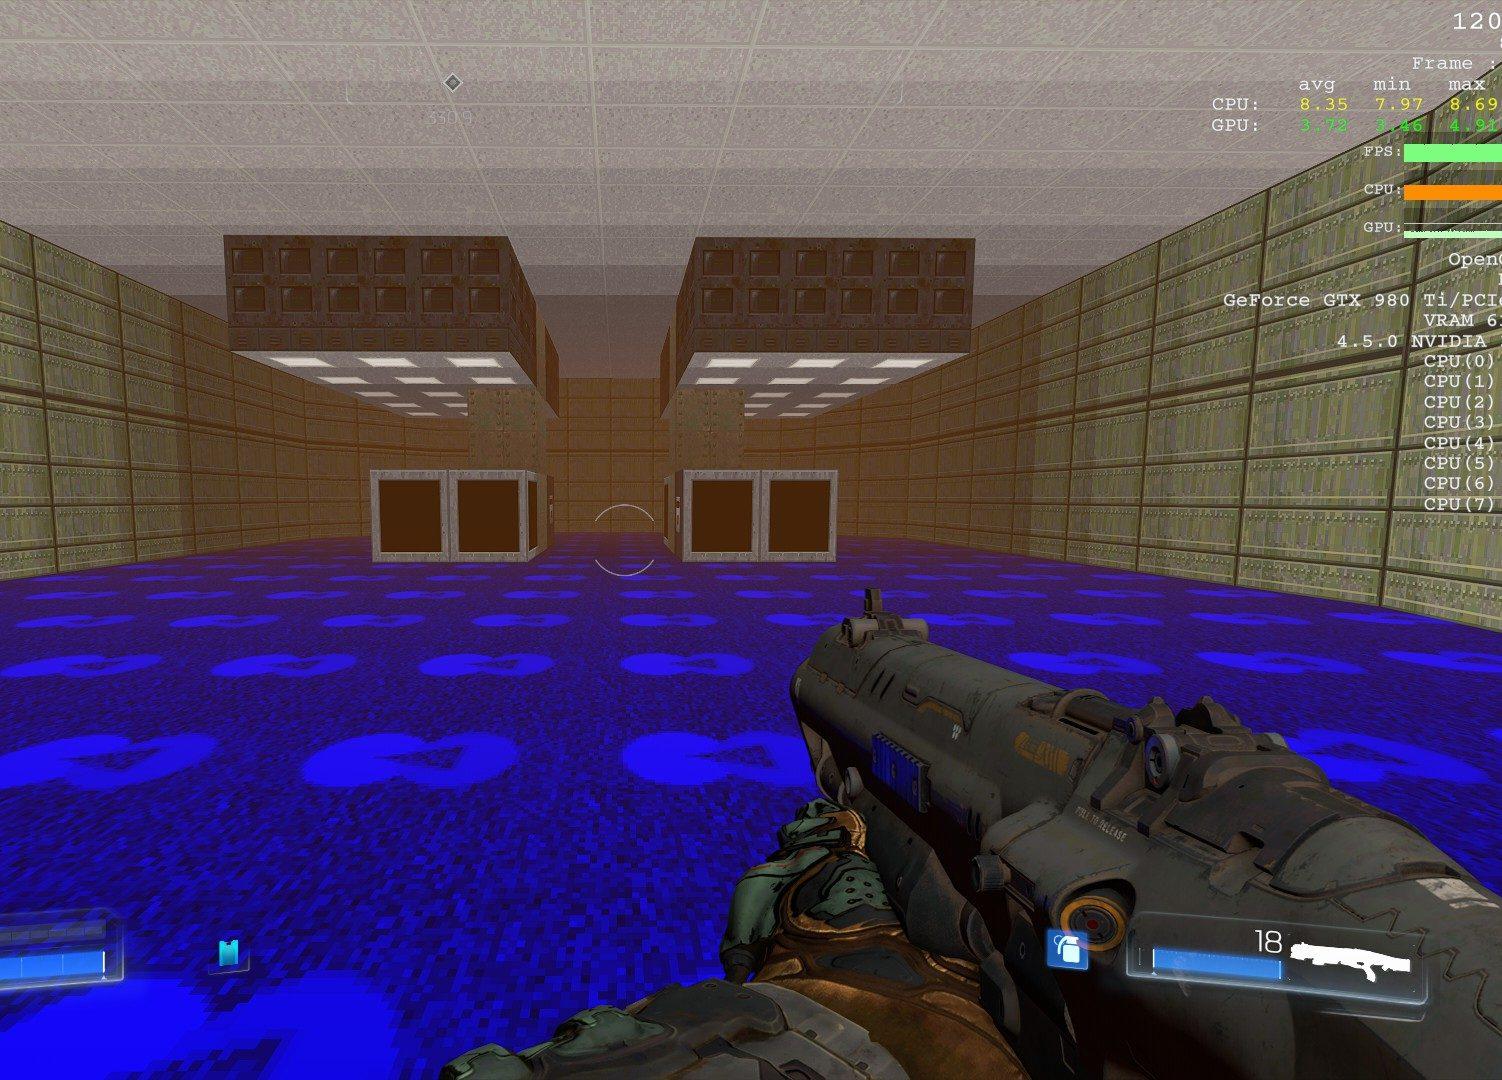 doom 2016 secret level the uac 3 e1605176713893 Hidden Video Game Levels You've Definitely Never Played